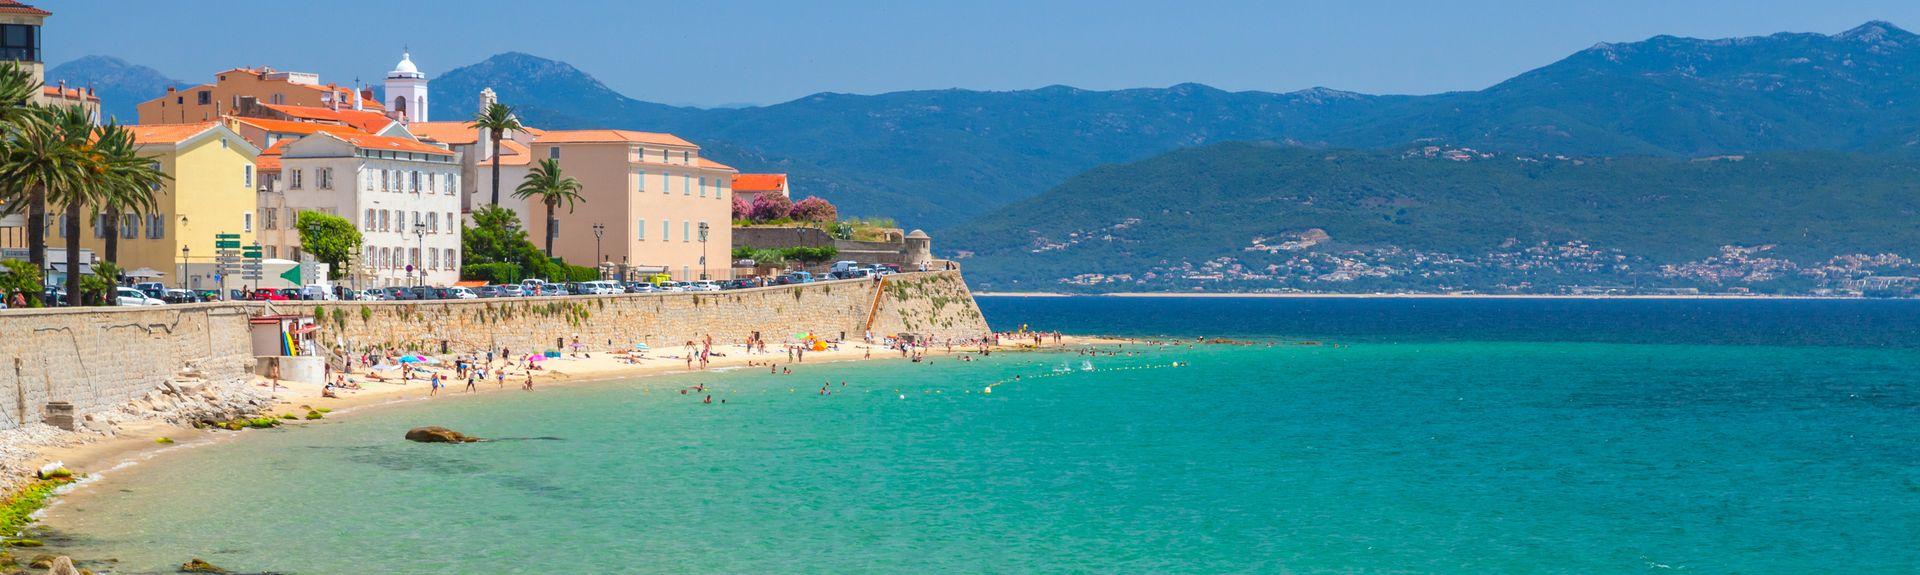 Ajaccio, Korsika, Frankreich